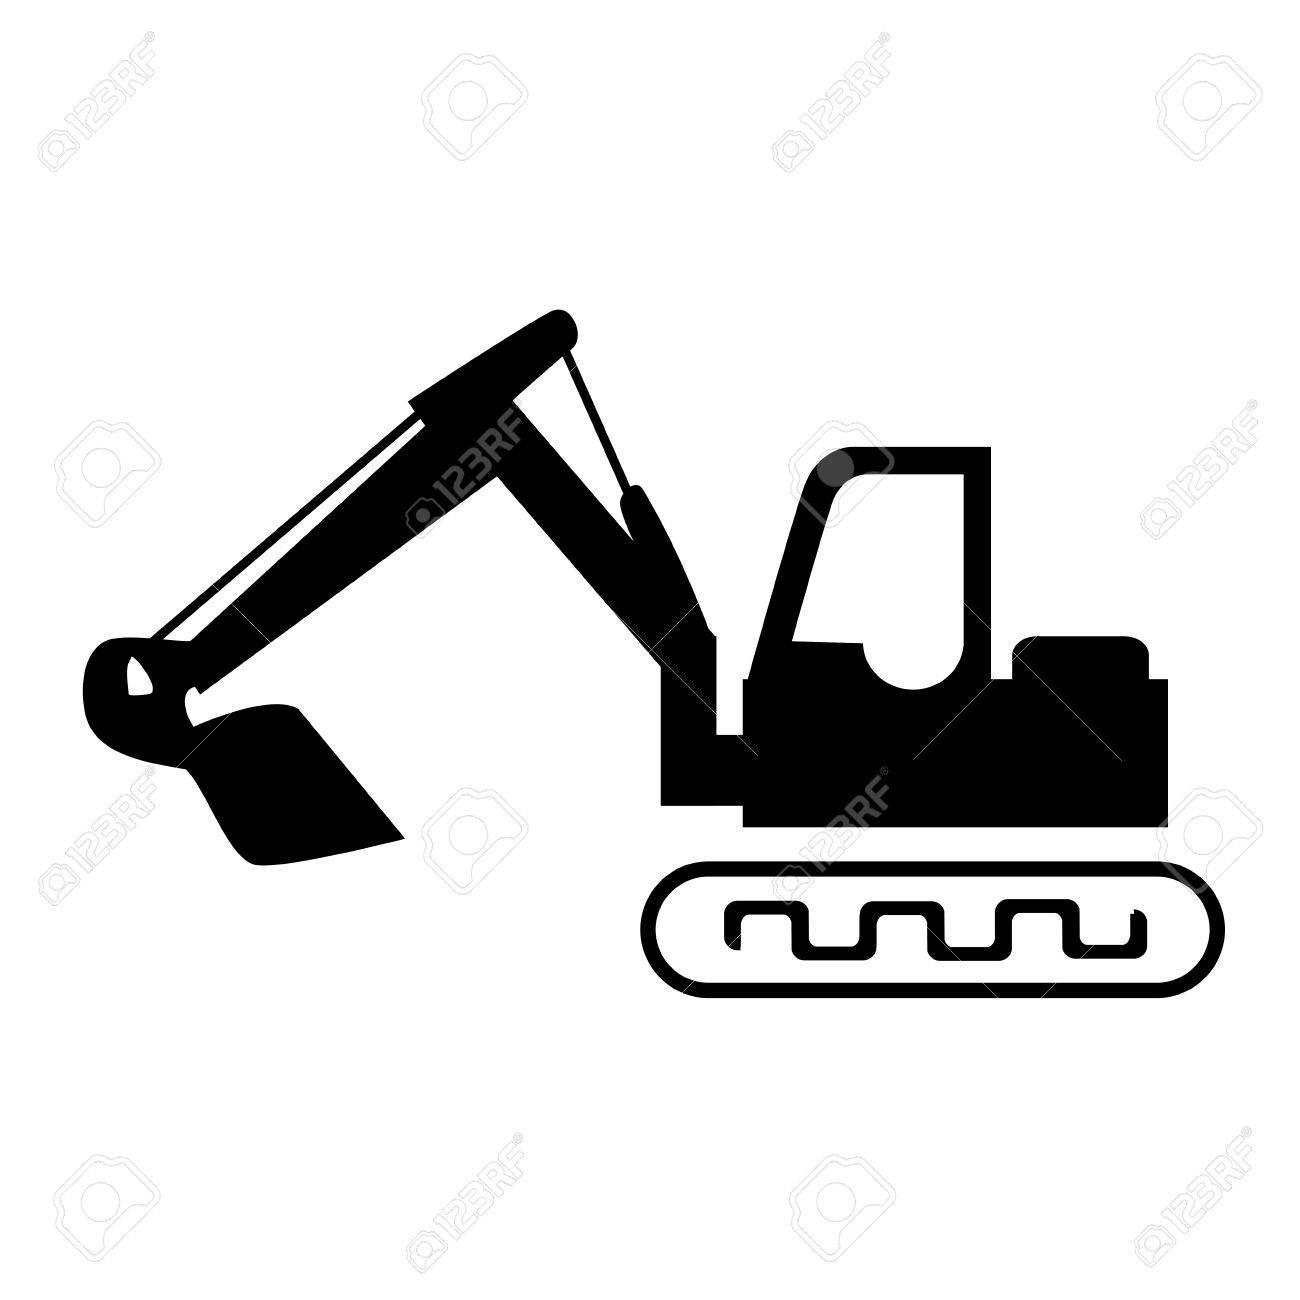 silhouette backhoe with crane for construction vector illustration rh 123rf com construction vector logo free construction vector art